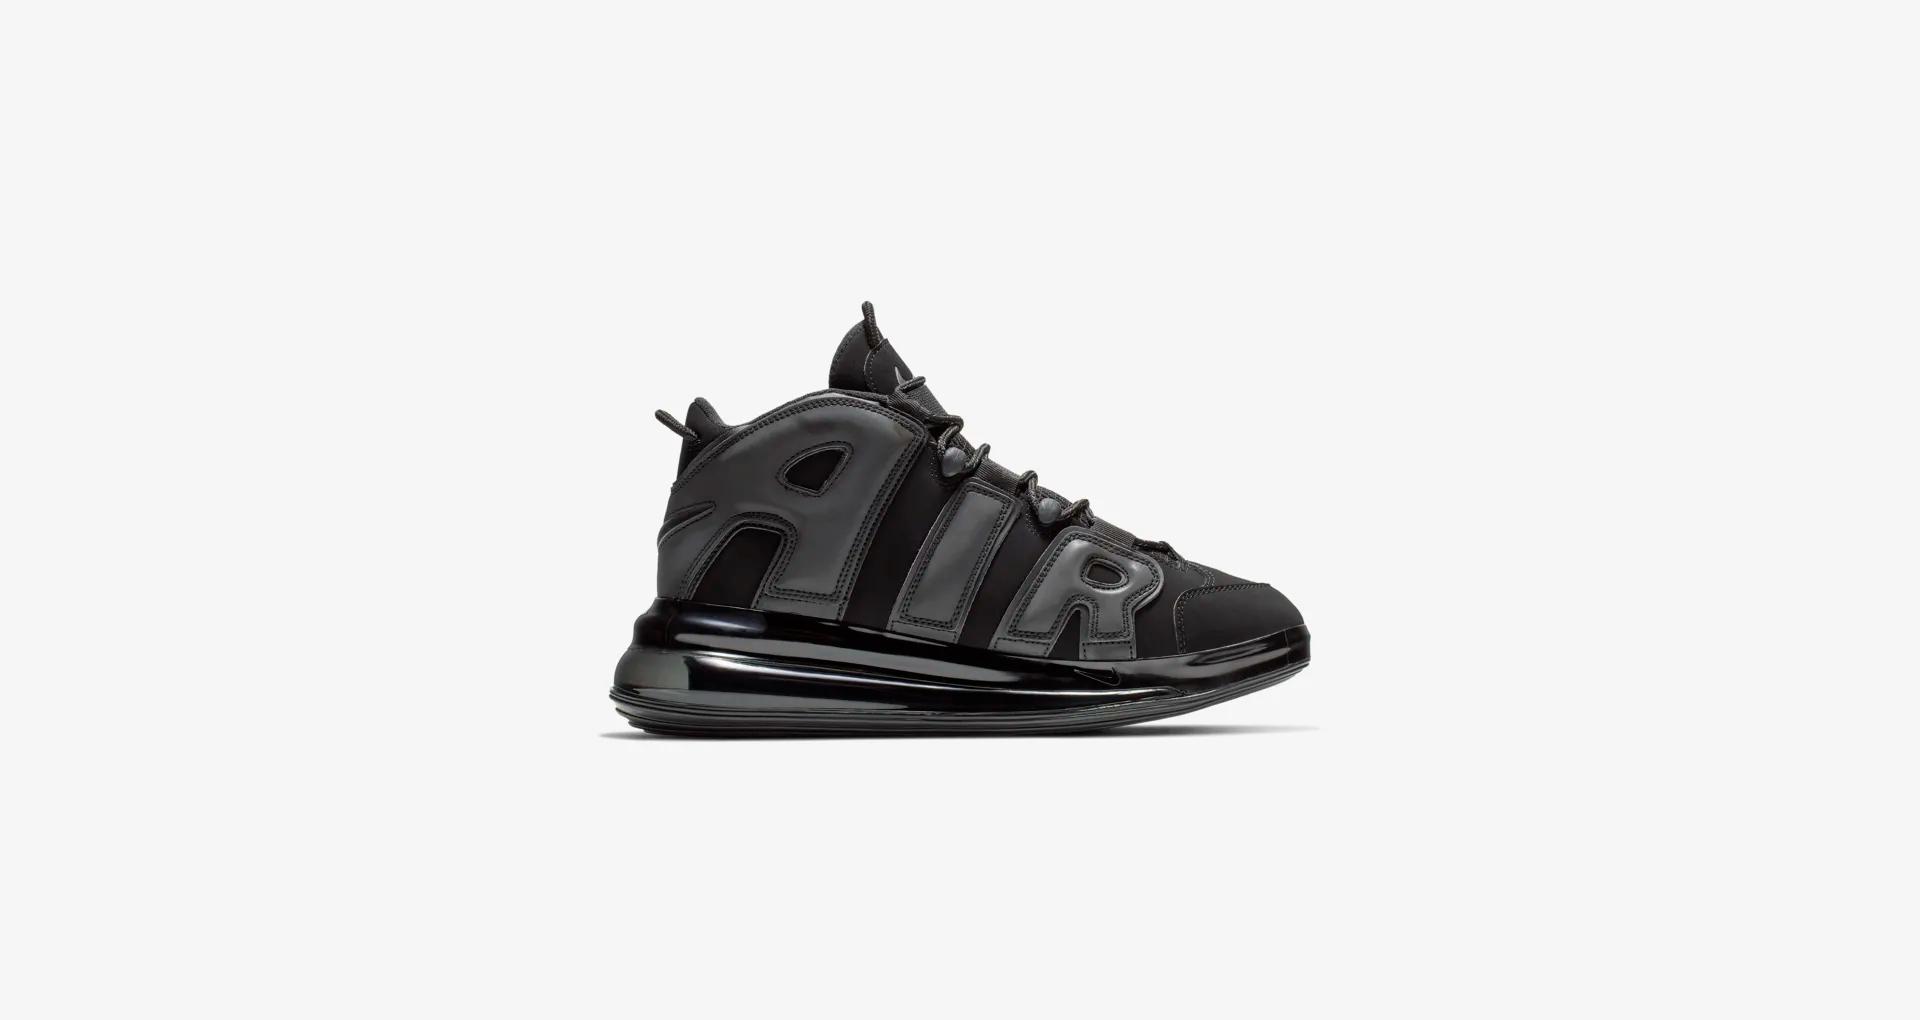 BQ7668 001 Nike Air More Uptempo 720 Black 3